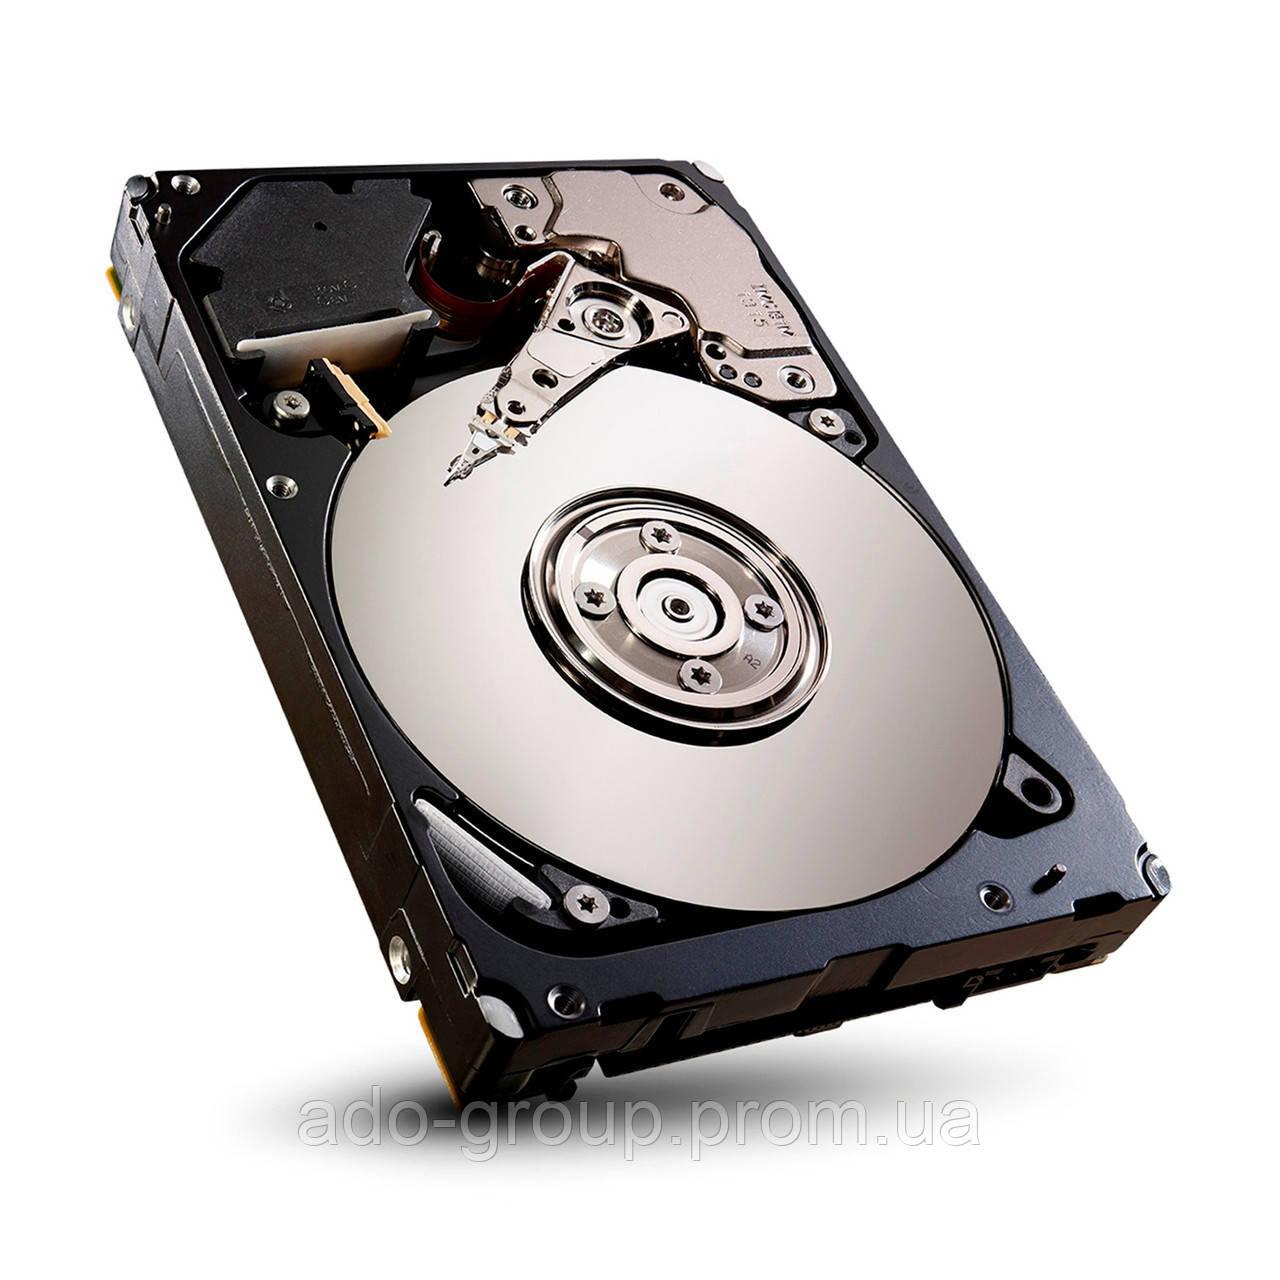 "033XMR Жесткий диск Dell 600GB SAS 15K  3.5"" +"